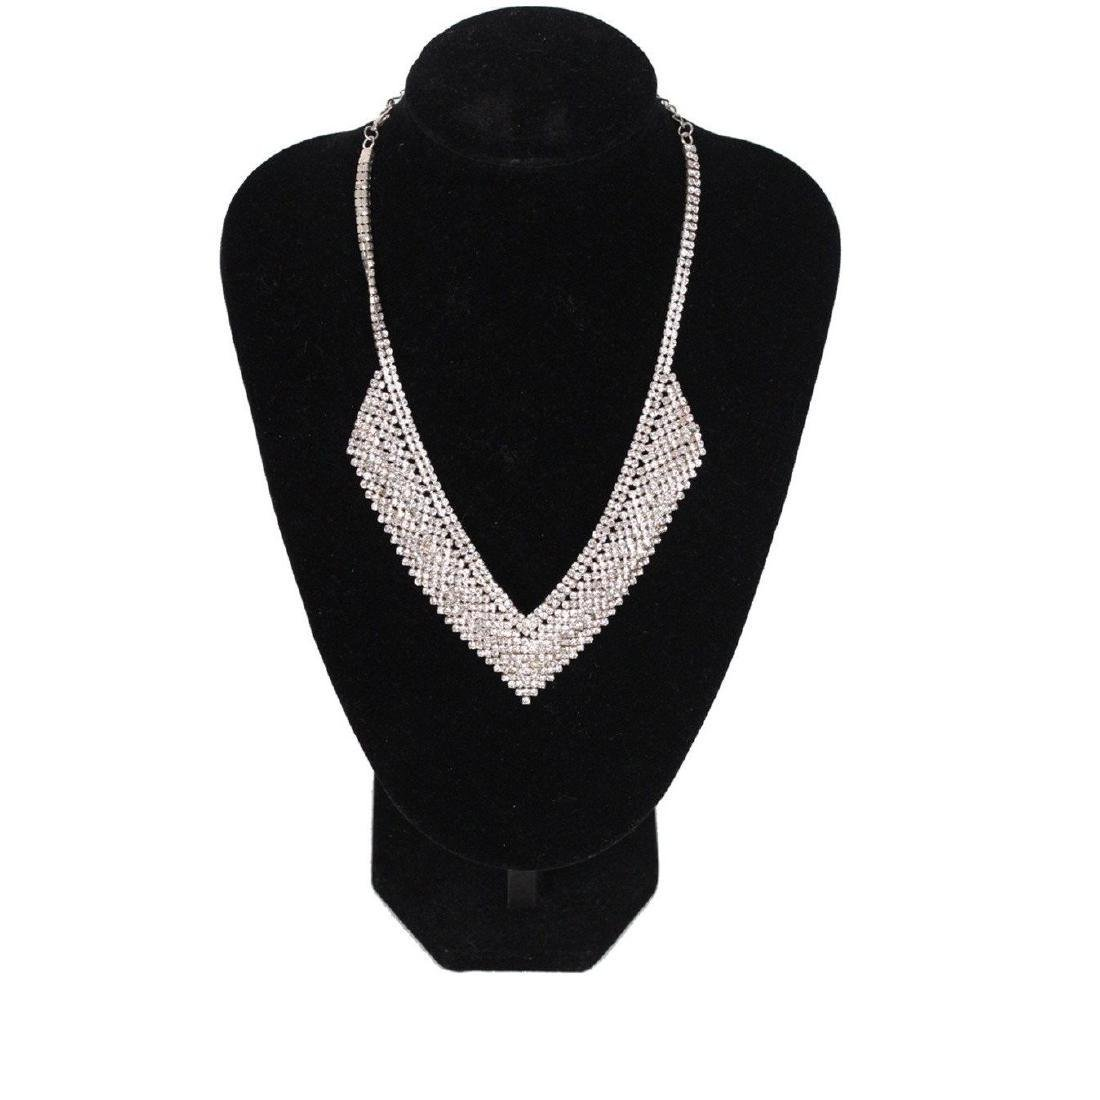 Vintage Pave Rhinestones V Shaped Necklace